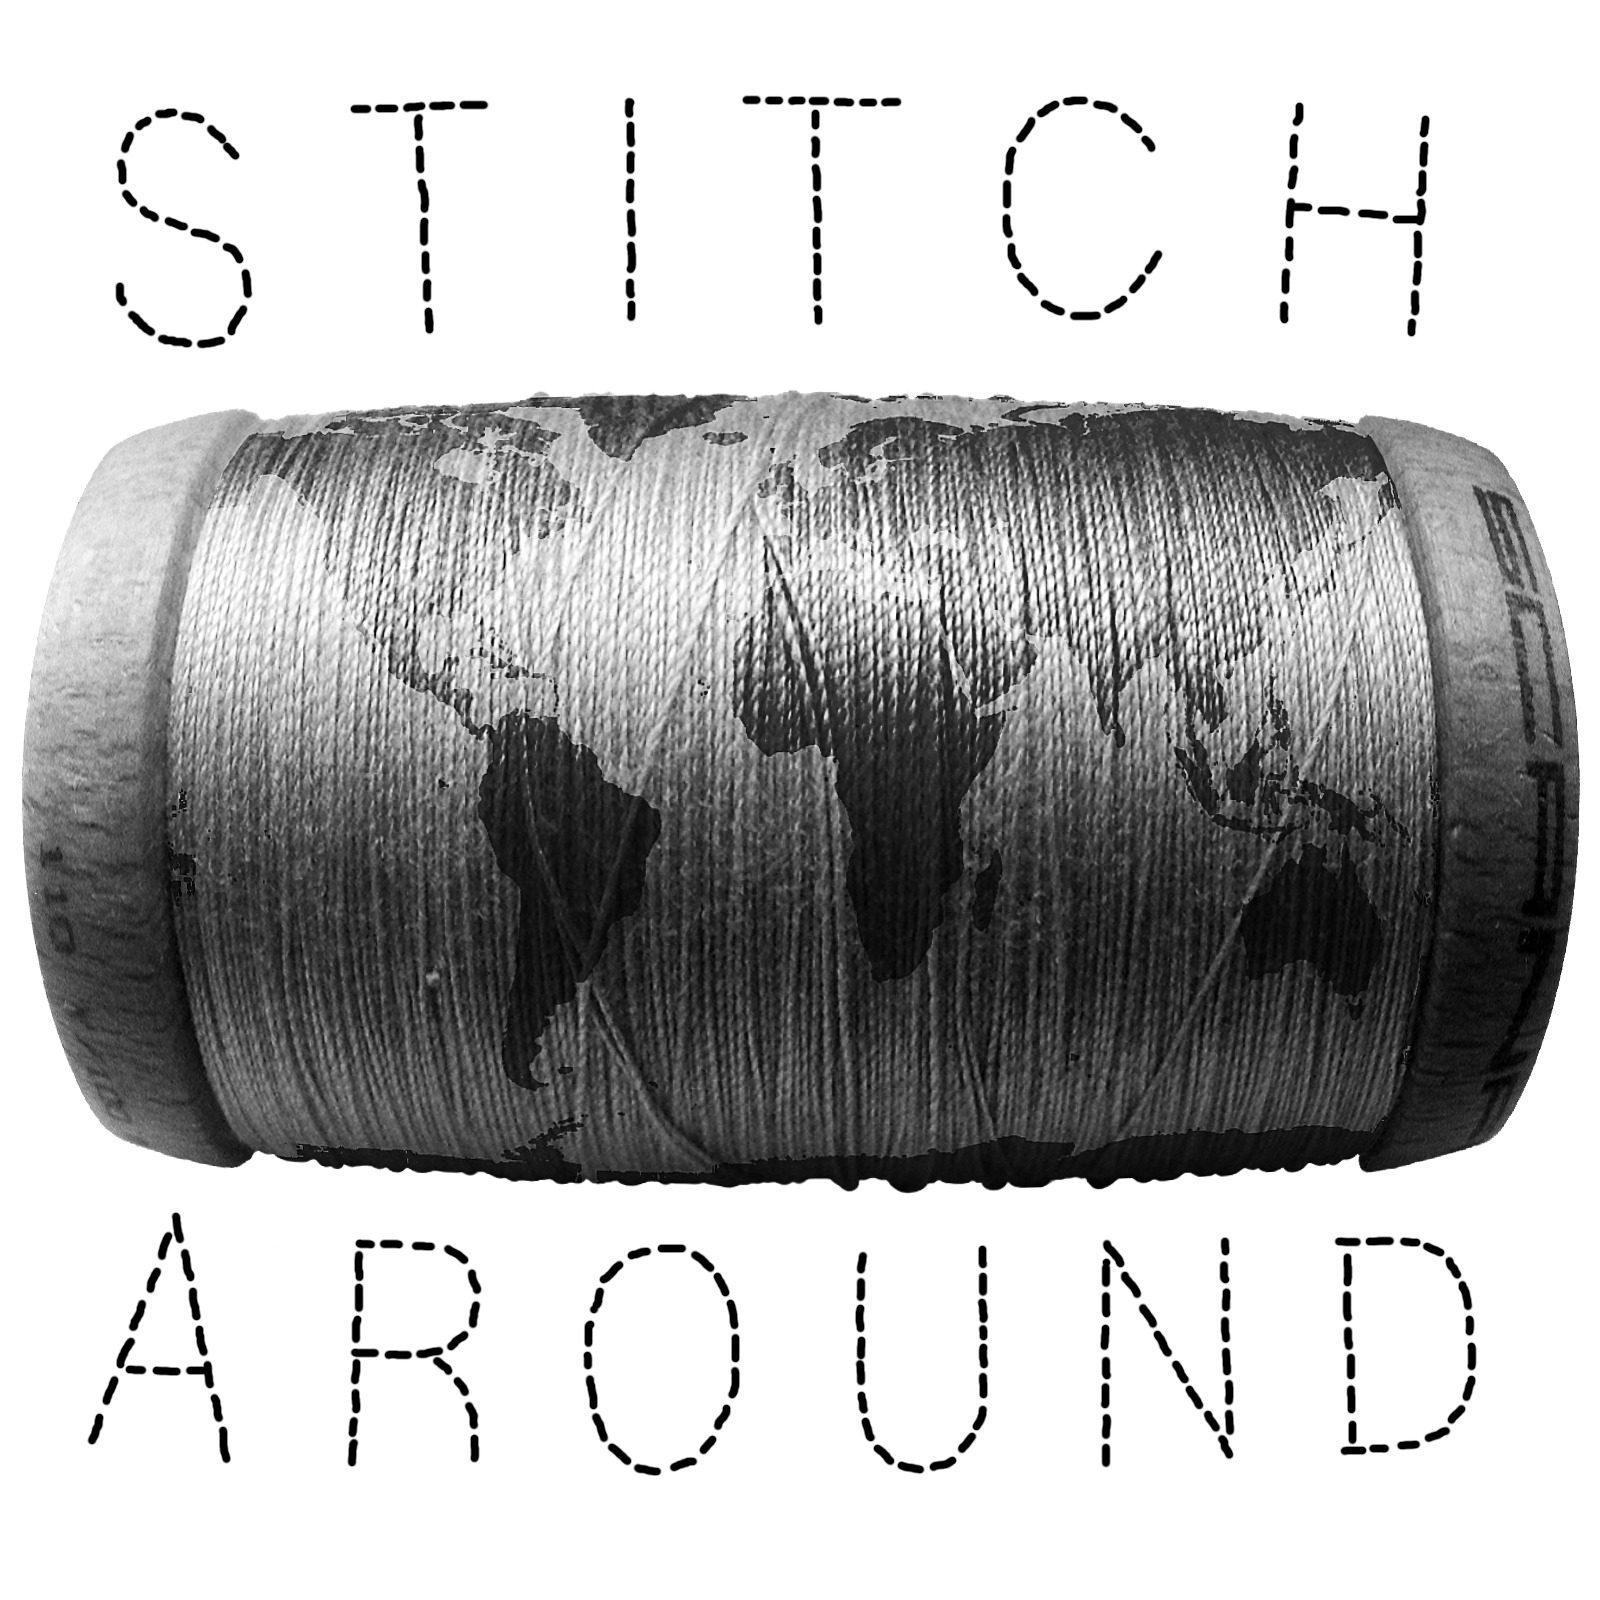 StitchAround